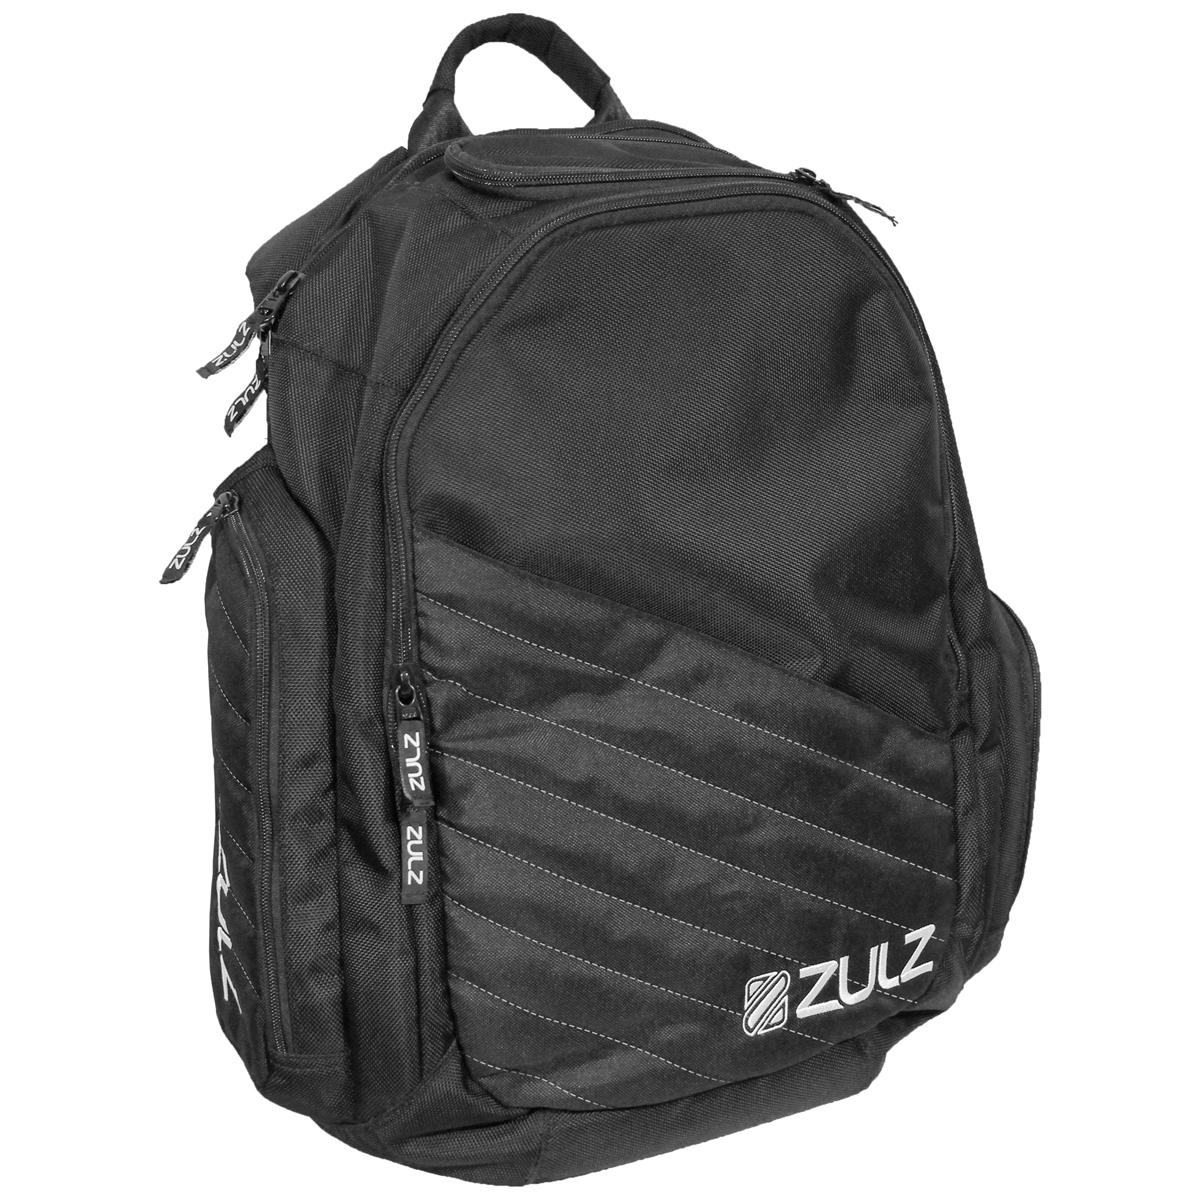 Zulz Pivot Black/Silver Backpack